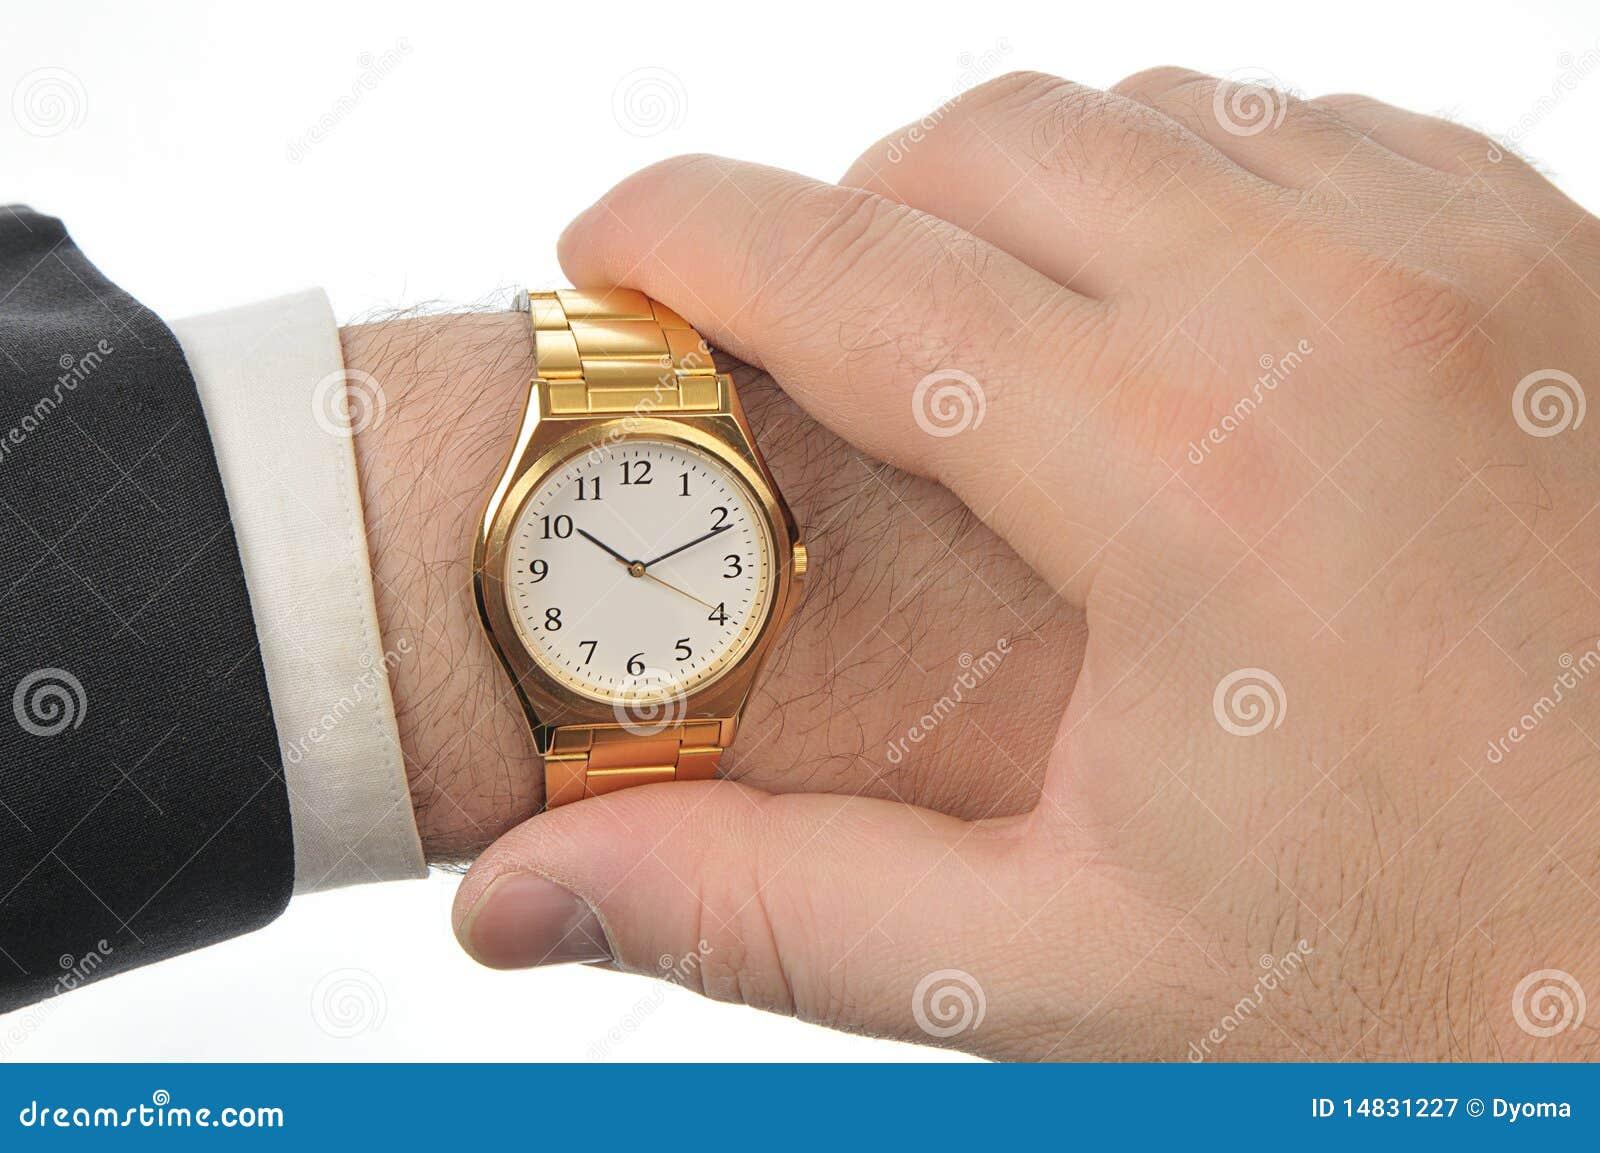 Wrist Watch Clipart Free